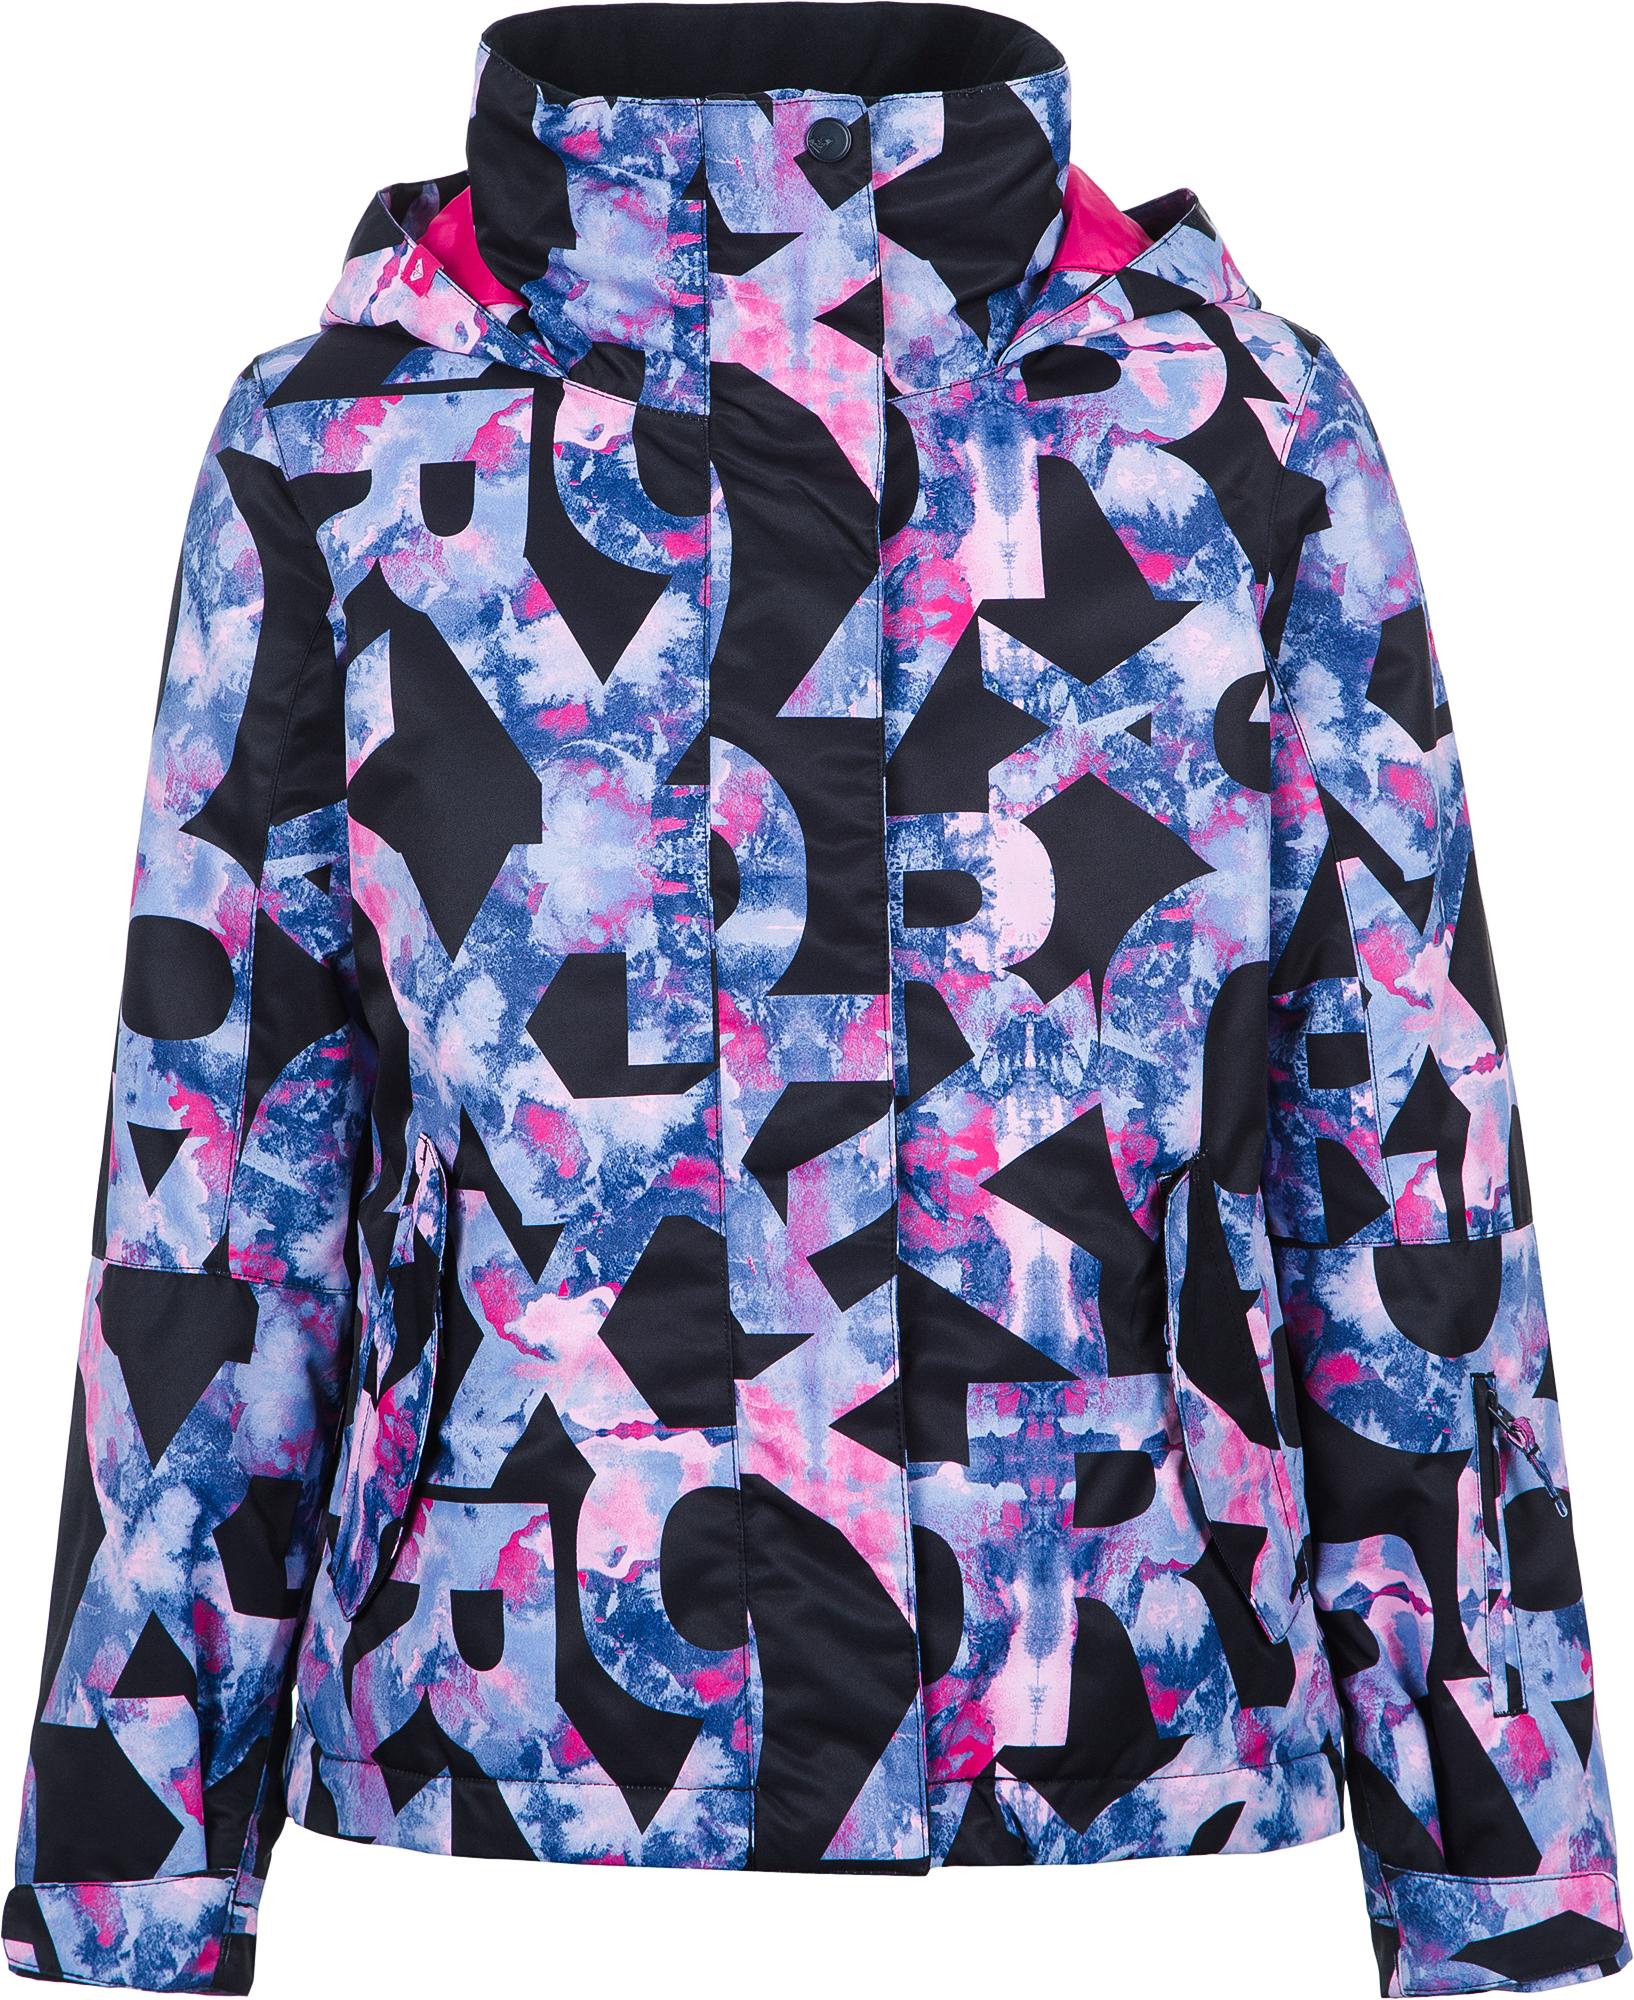 Roxy Куртка утепленная для девочек Jetty Girl, размер 164-170